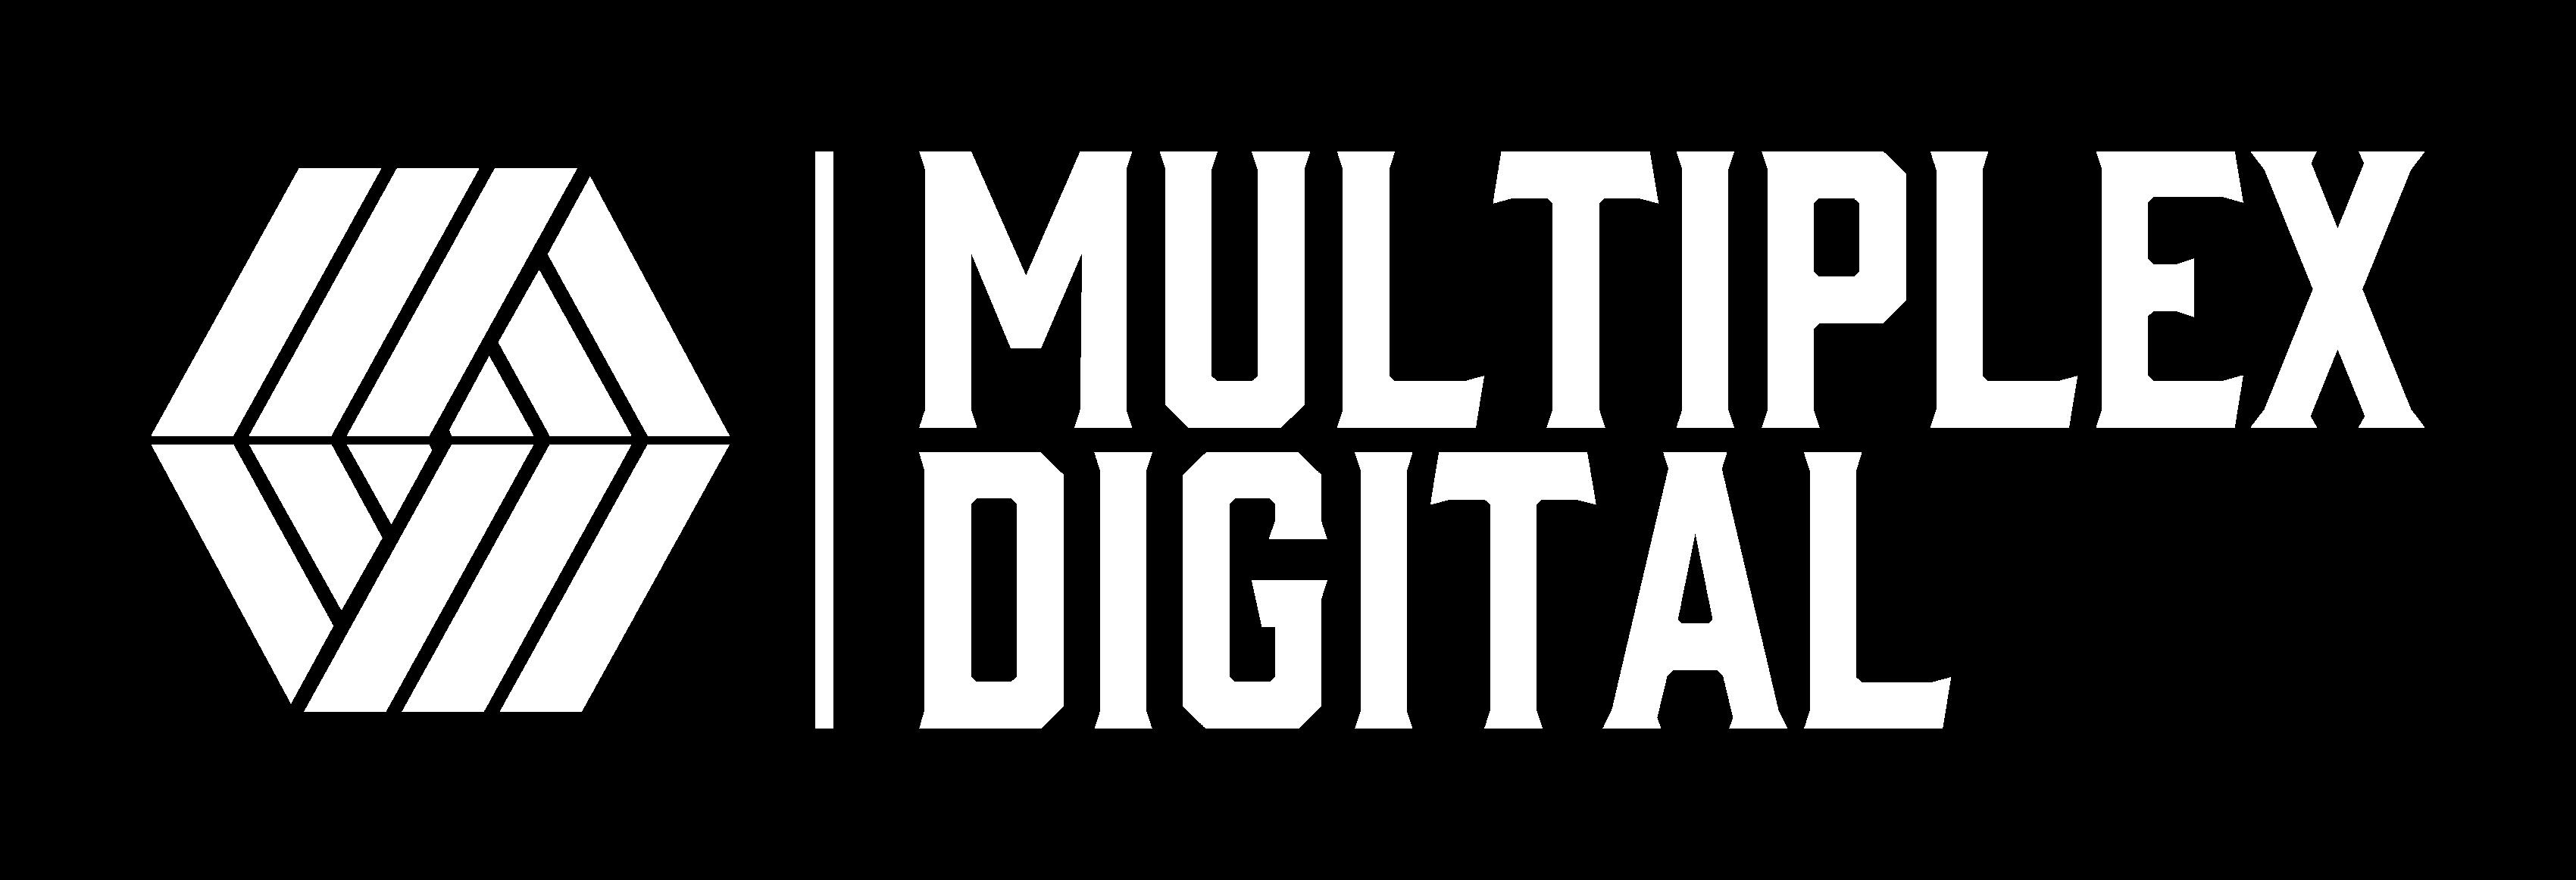 Multiplex-Digital-Doo